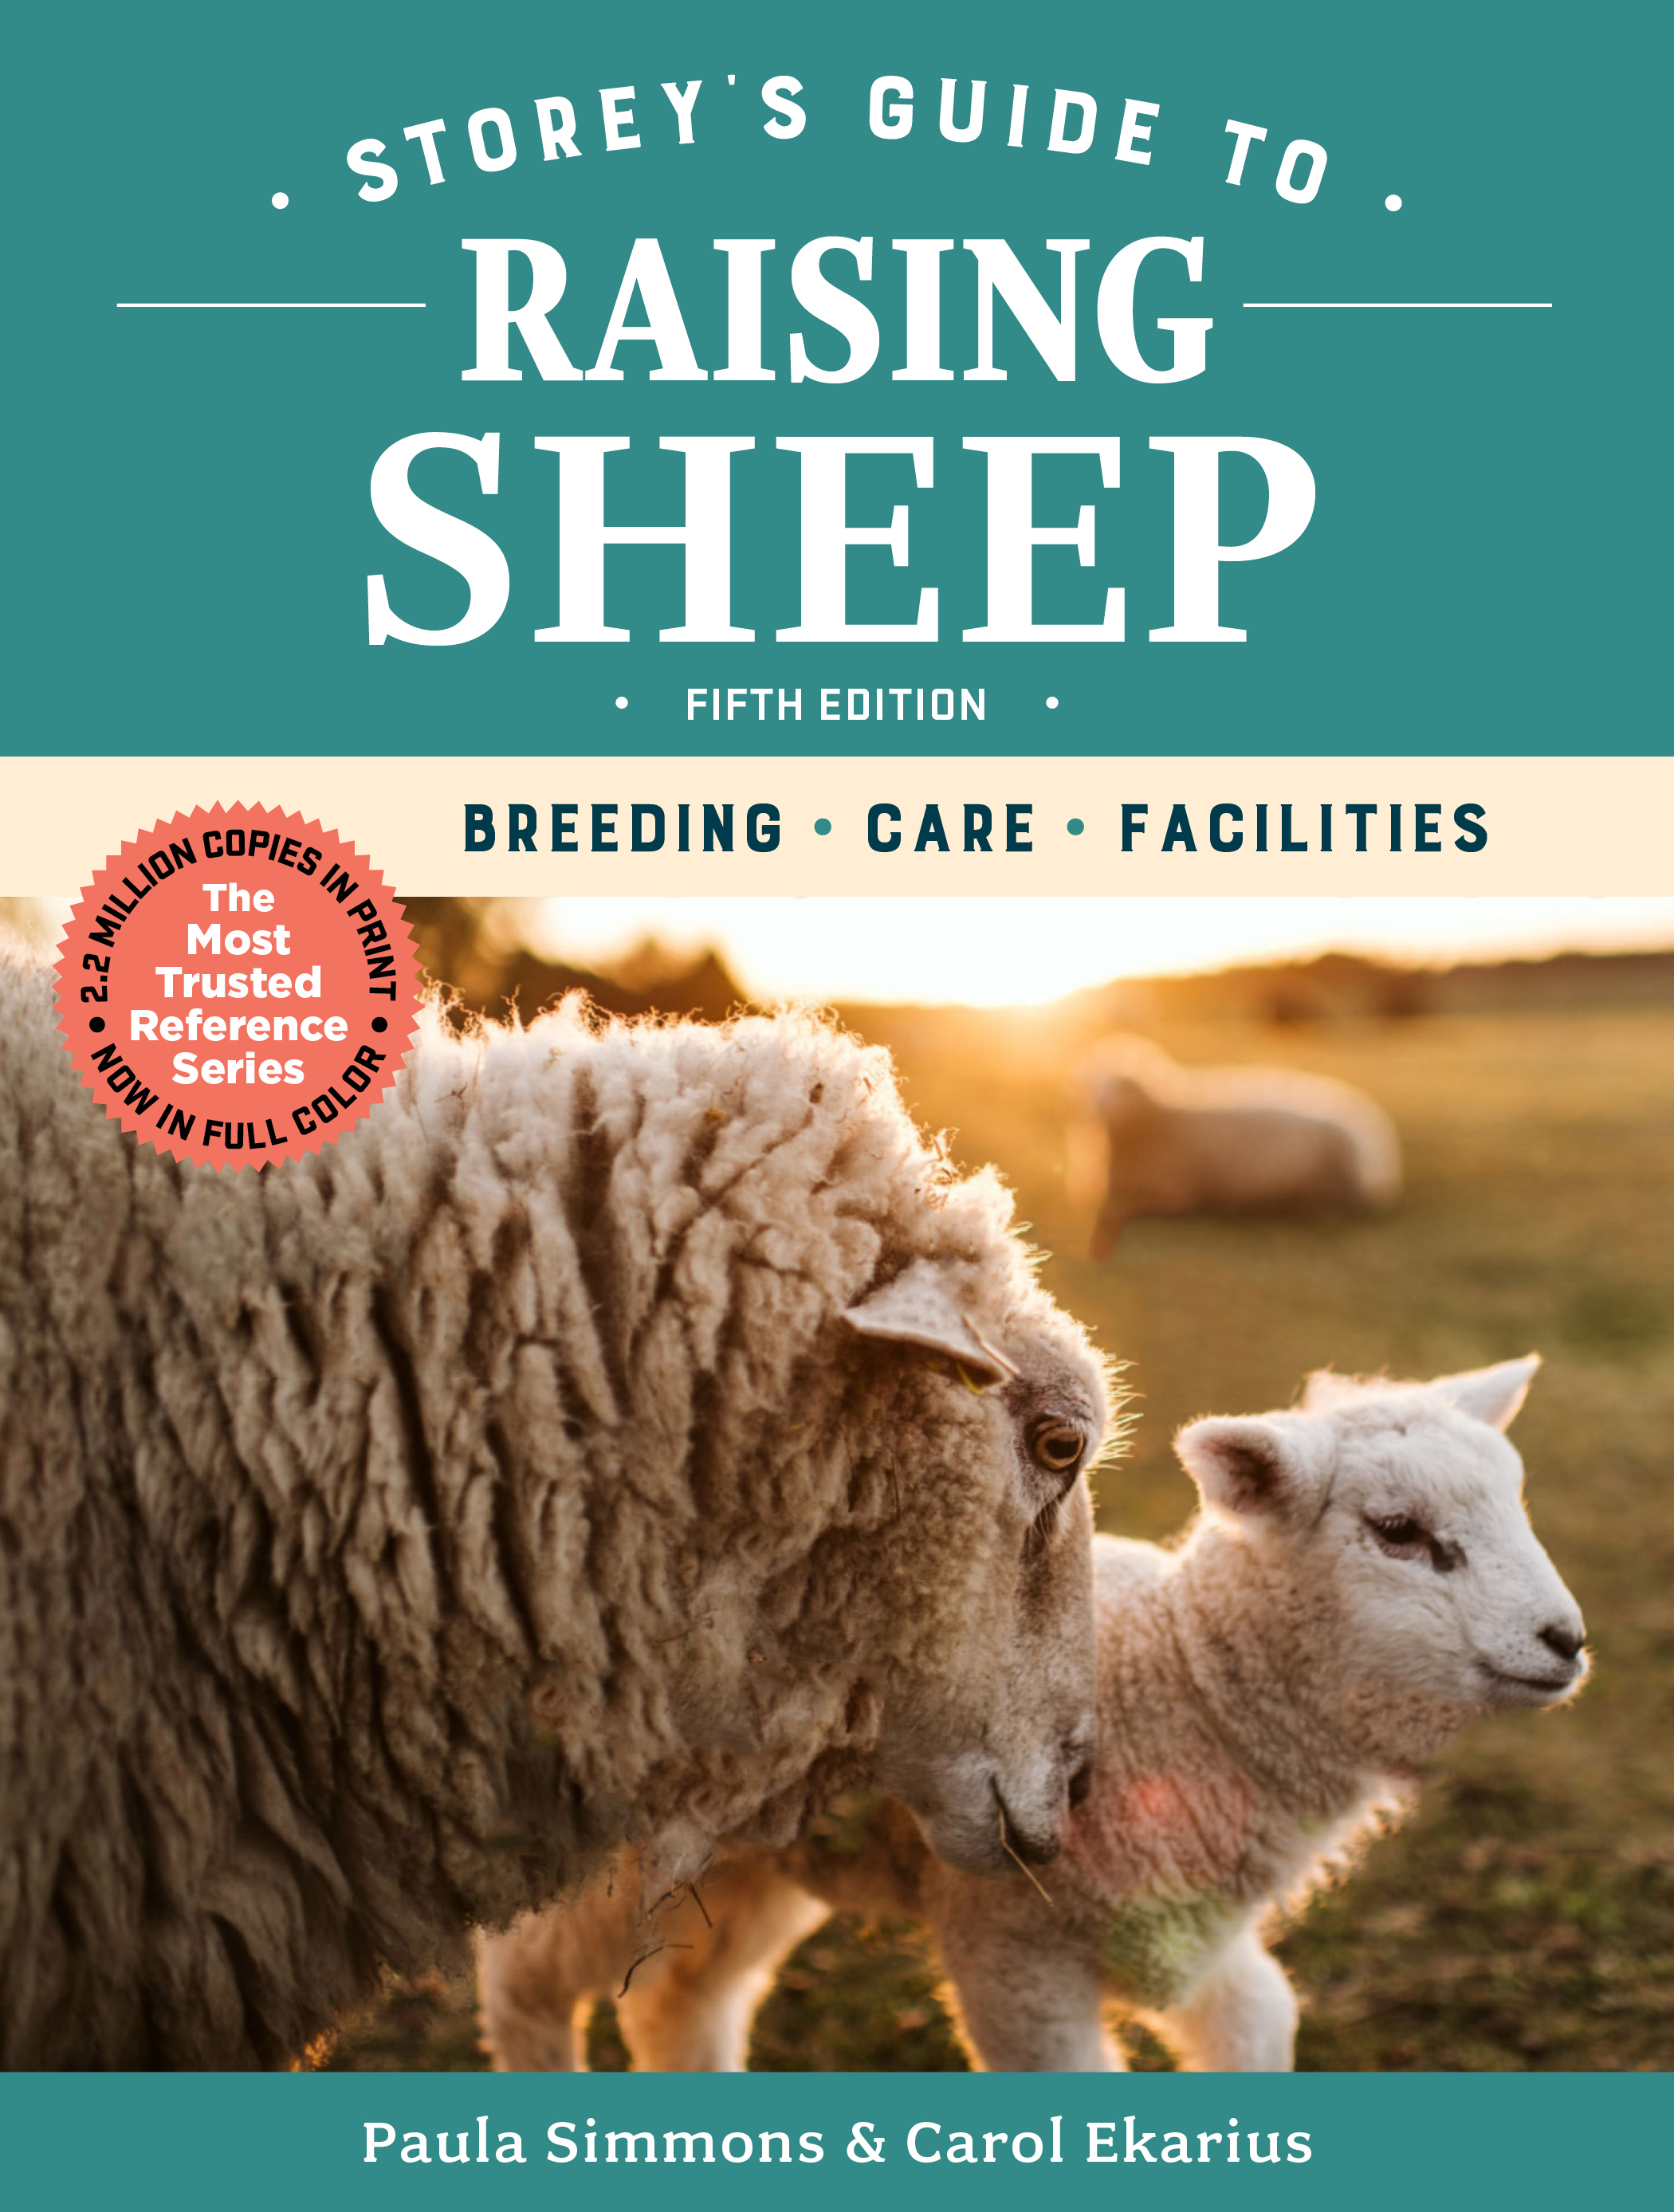 Storey's Guide to Raising Sheep, 5th Edition Breeding, Care, Facilities - Paula Simmons